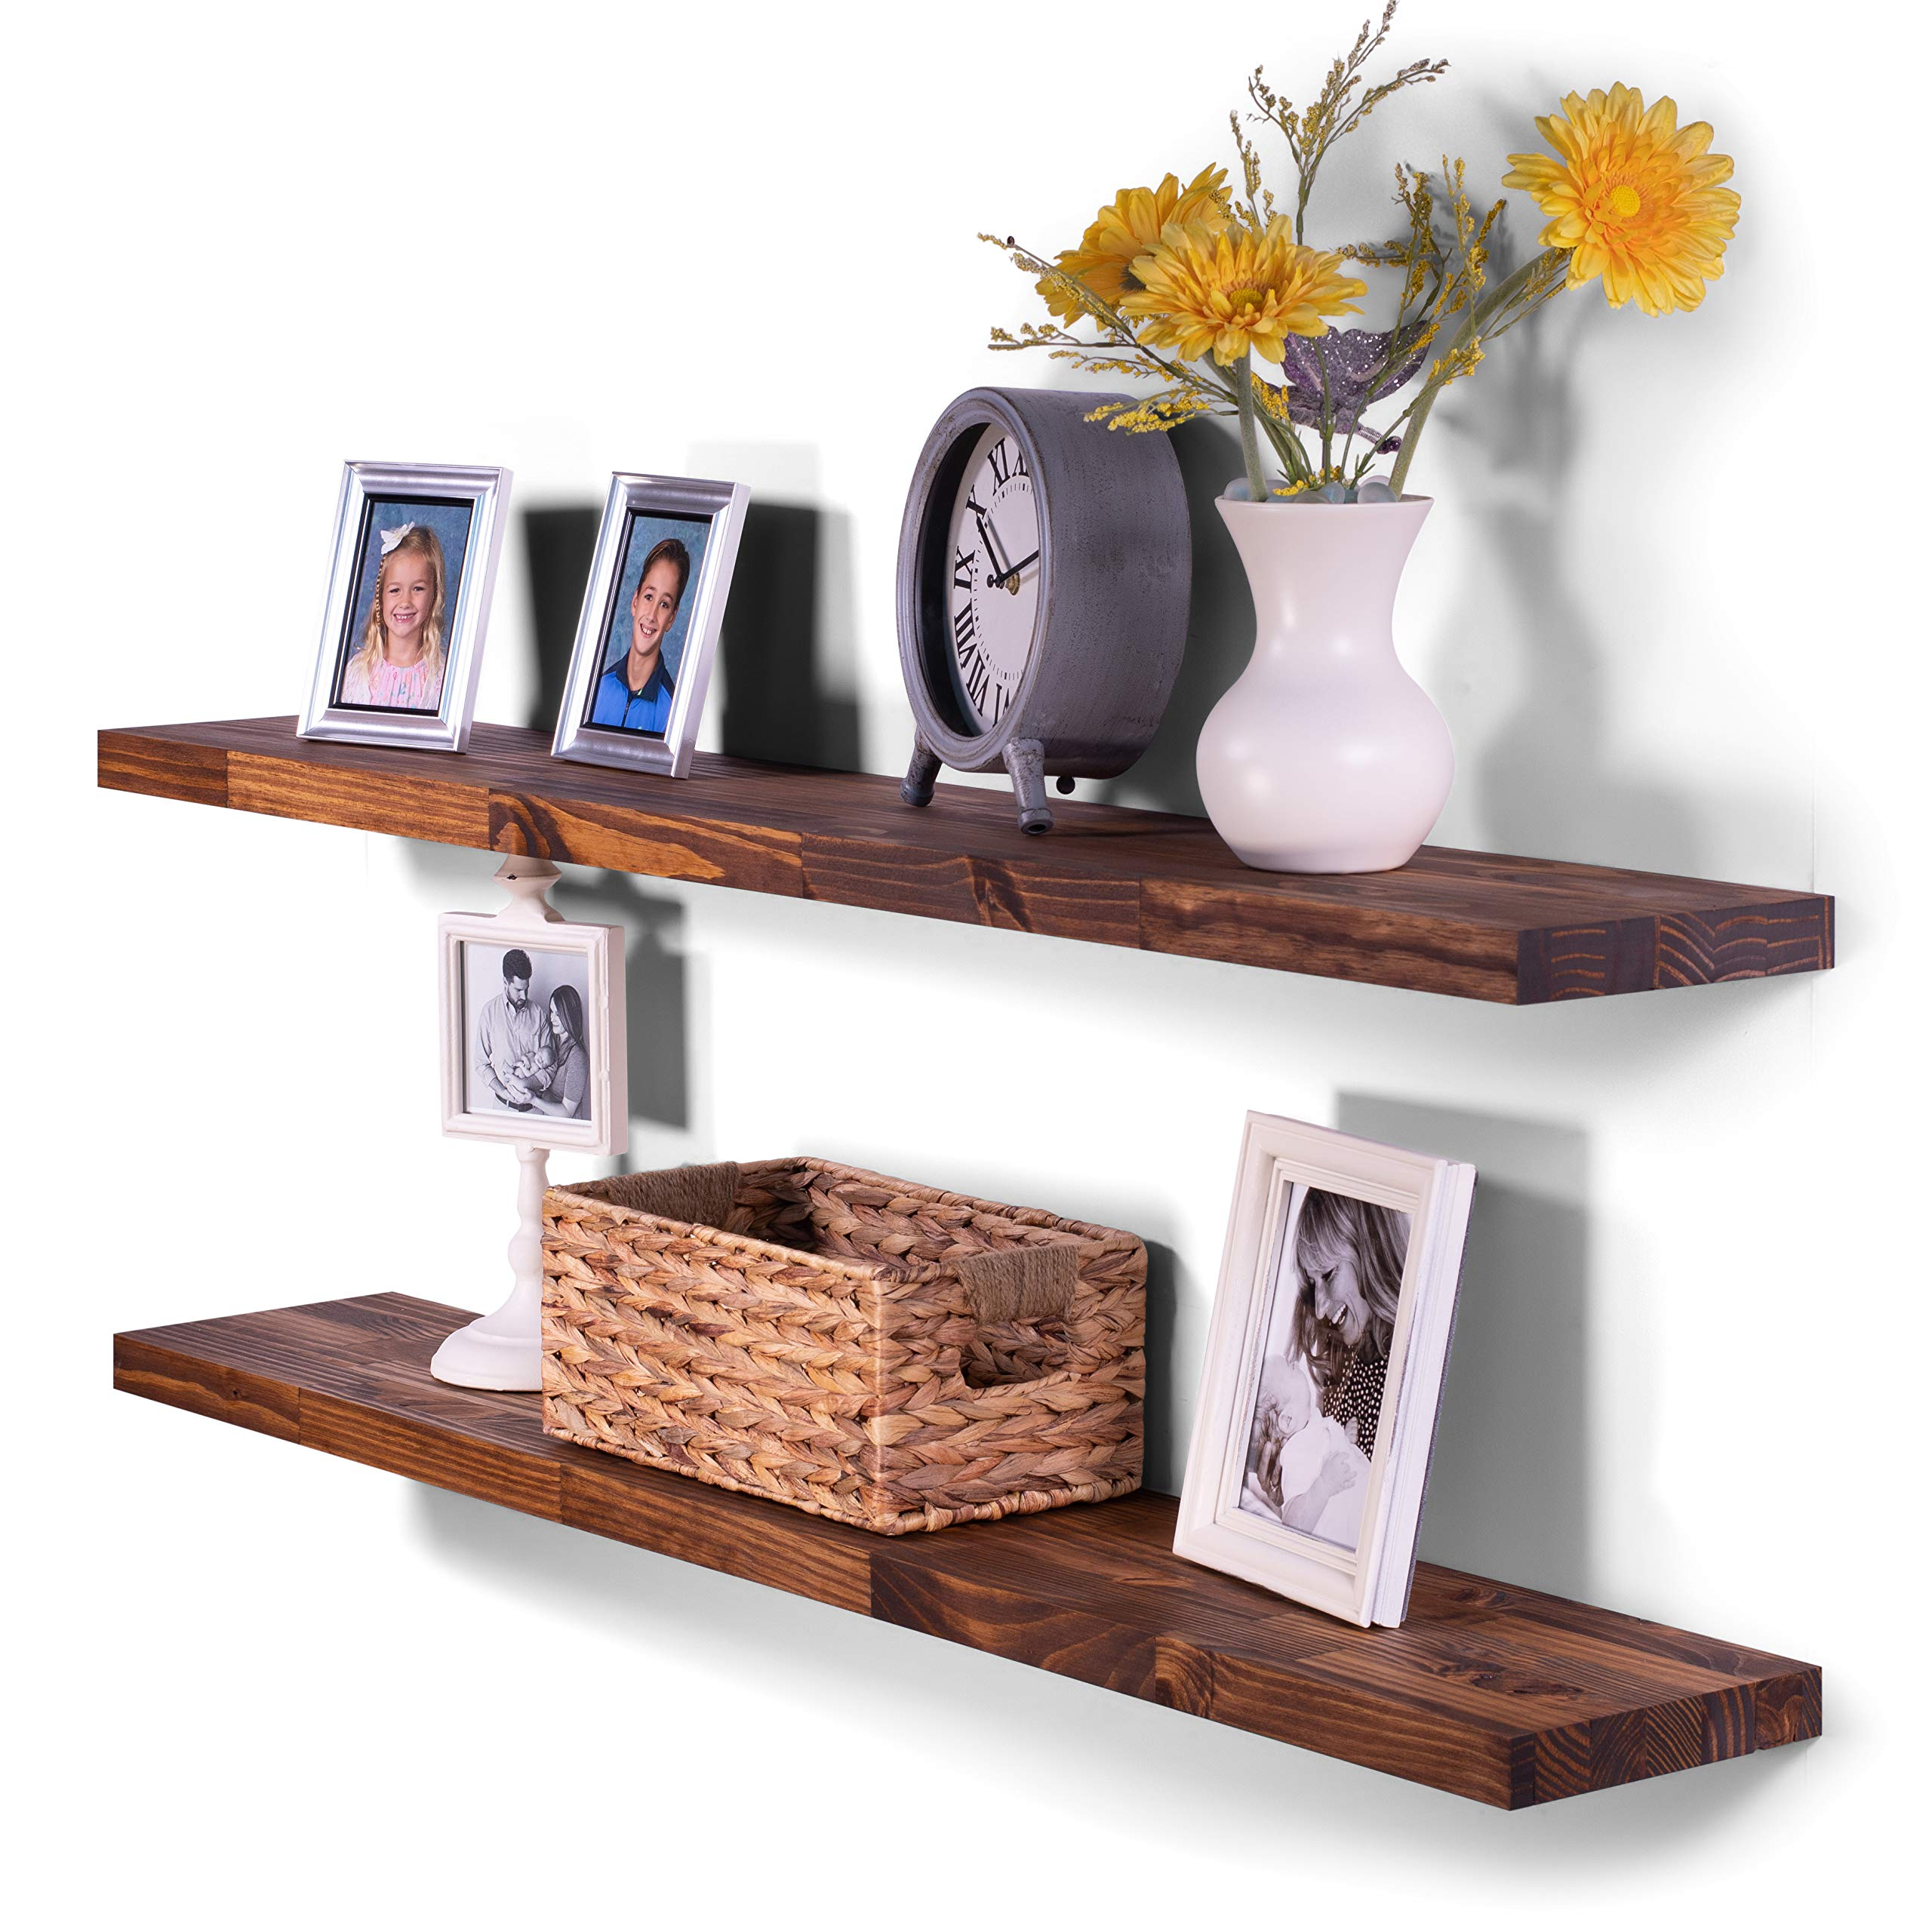 DAKODA LOVE 8'' Deep Butcher Block Floating Shelves, USA Handmade, Clear Coat Finish, 100% Countersunk Hidden Floating Shelf Brackets, Rustic Pine Wood (Set of 2) (48'', Bourbon)